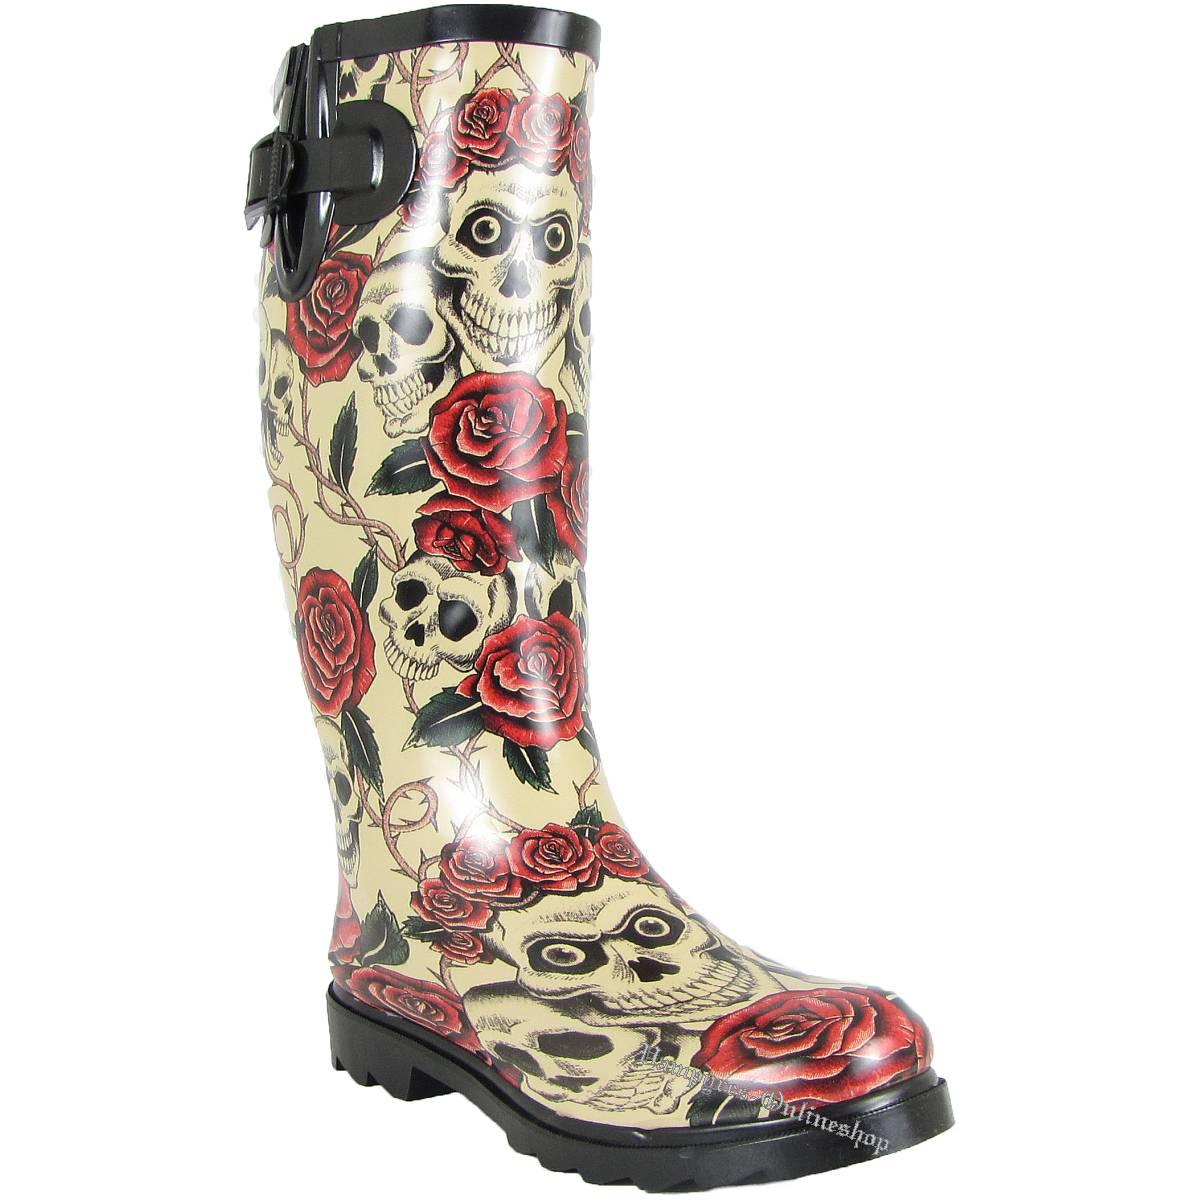 alcatraz skull roses rain boot beige totenkopf rosen. Black Bedroom Furniture Sets. Home Design Ideas